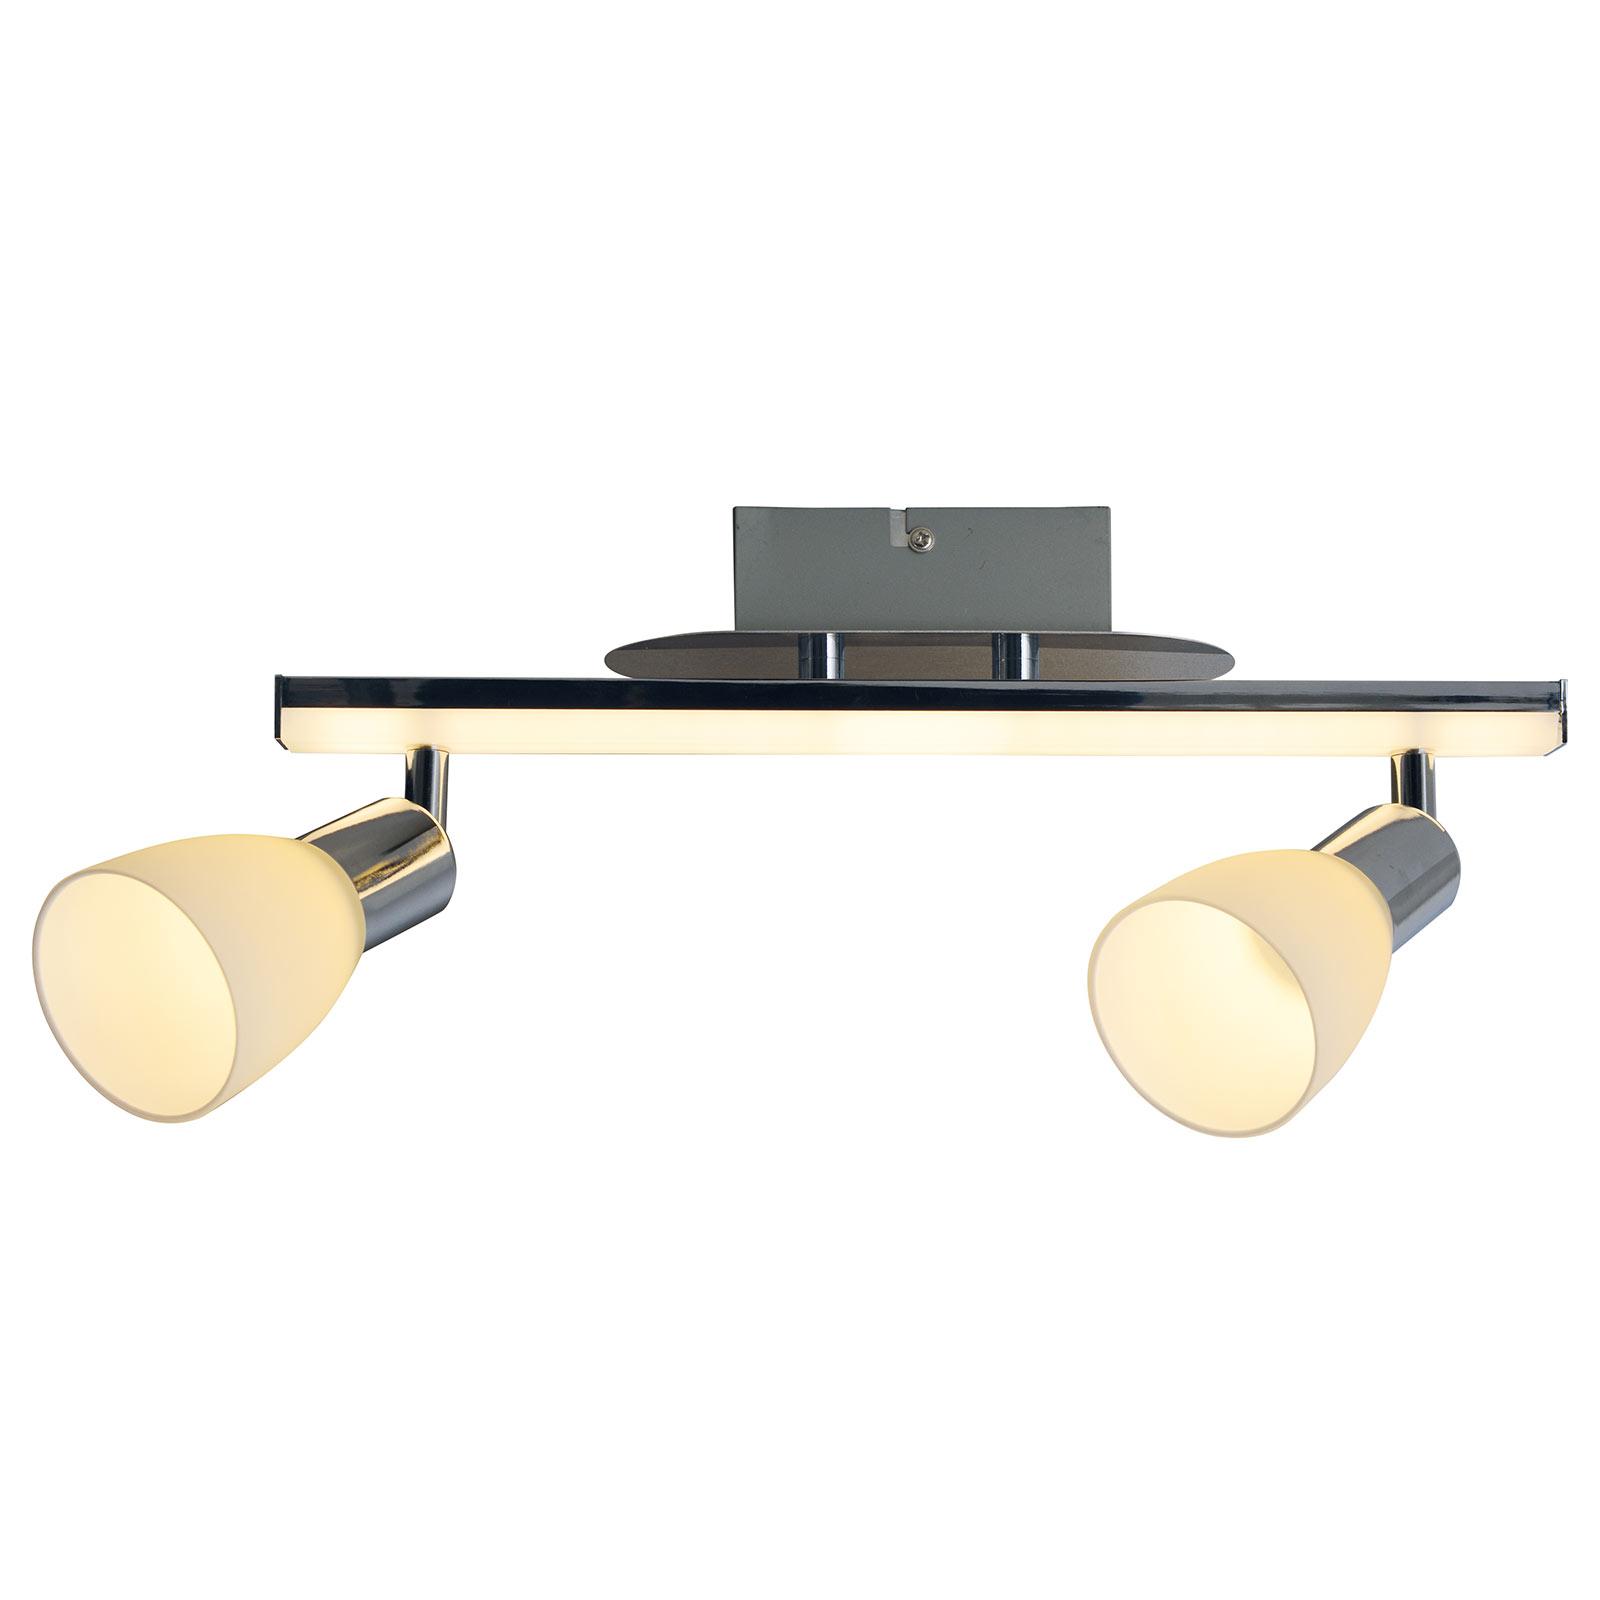 LED plafondlamp Ibiza 2-lamps lengte 39 cm